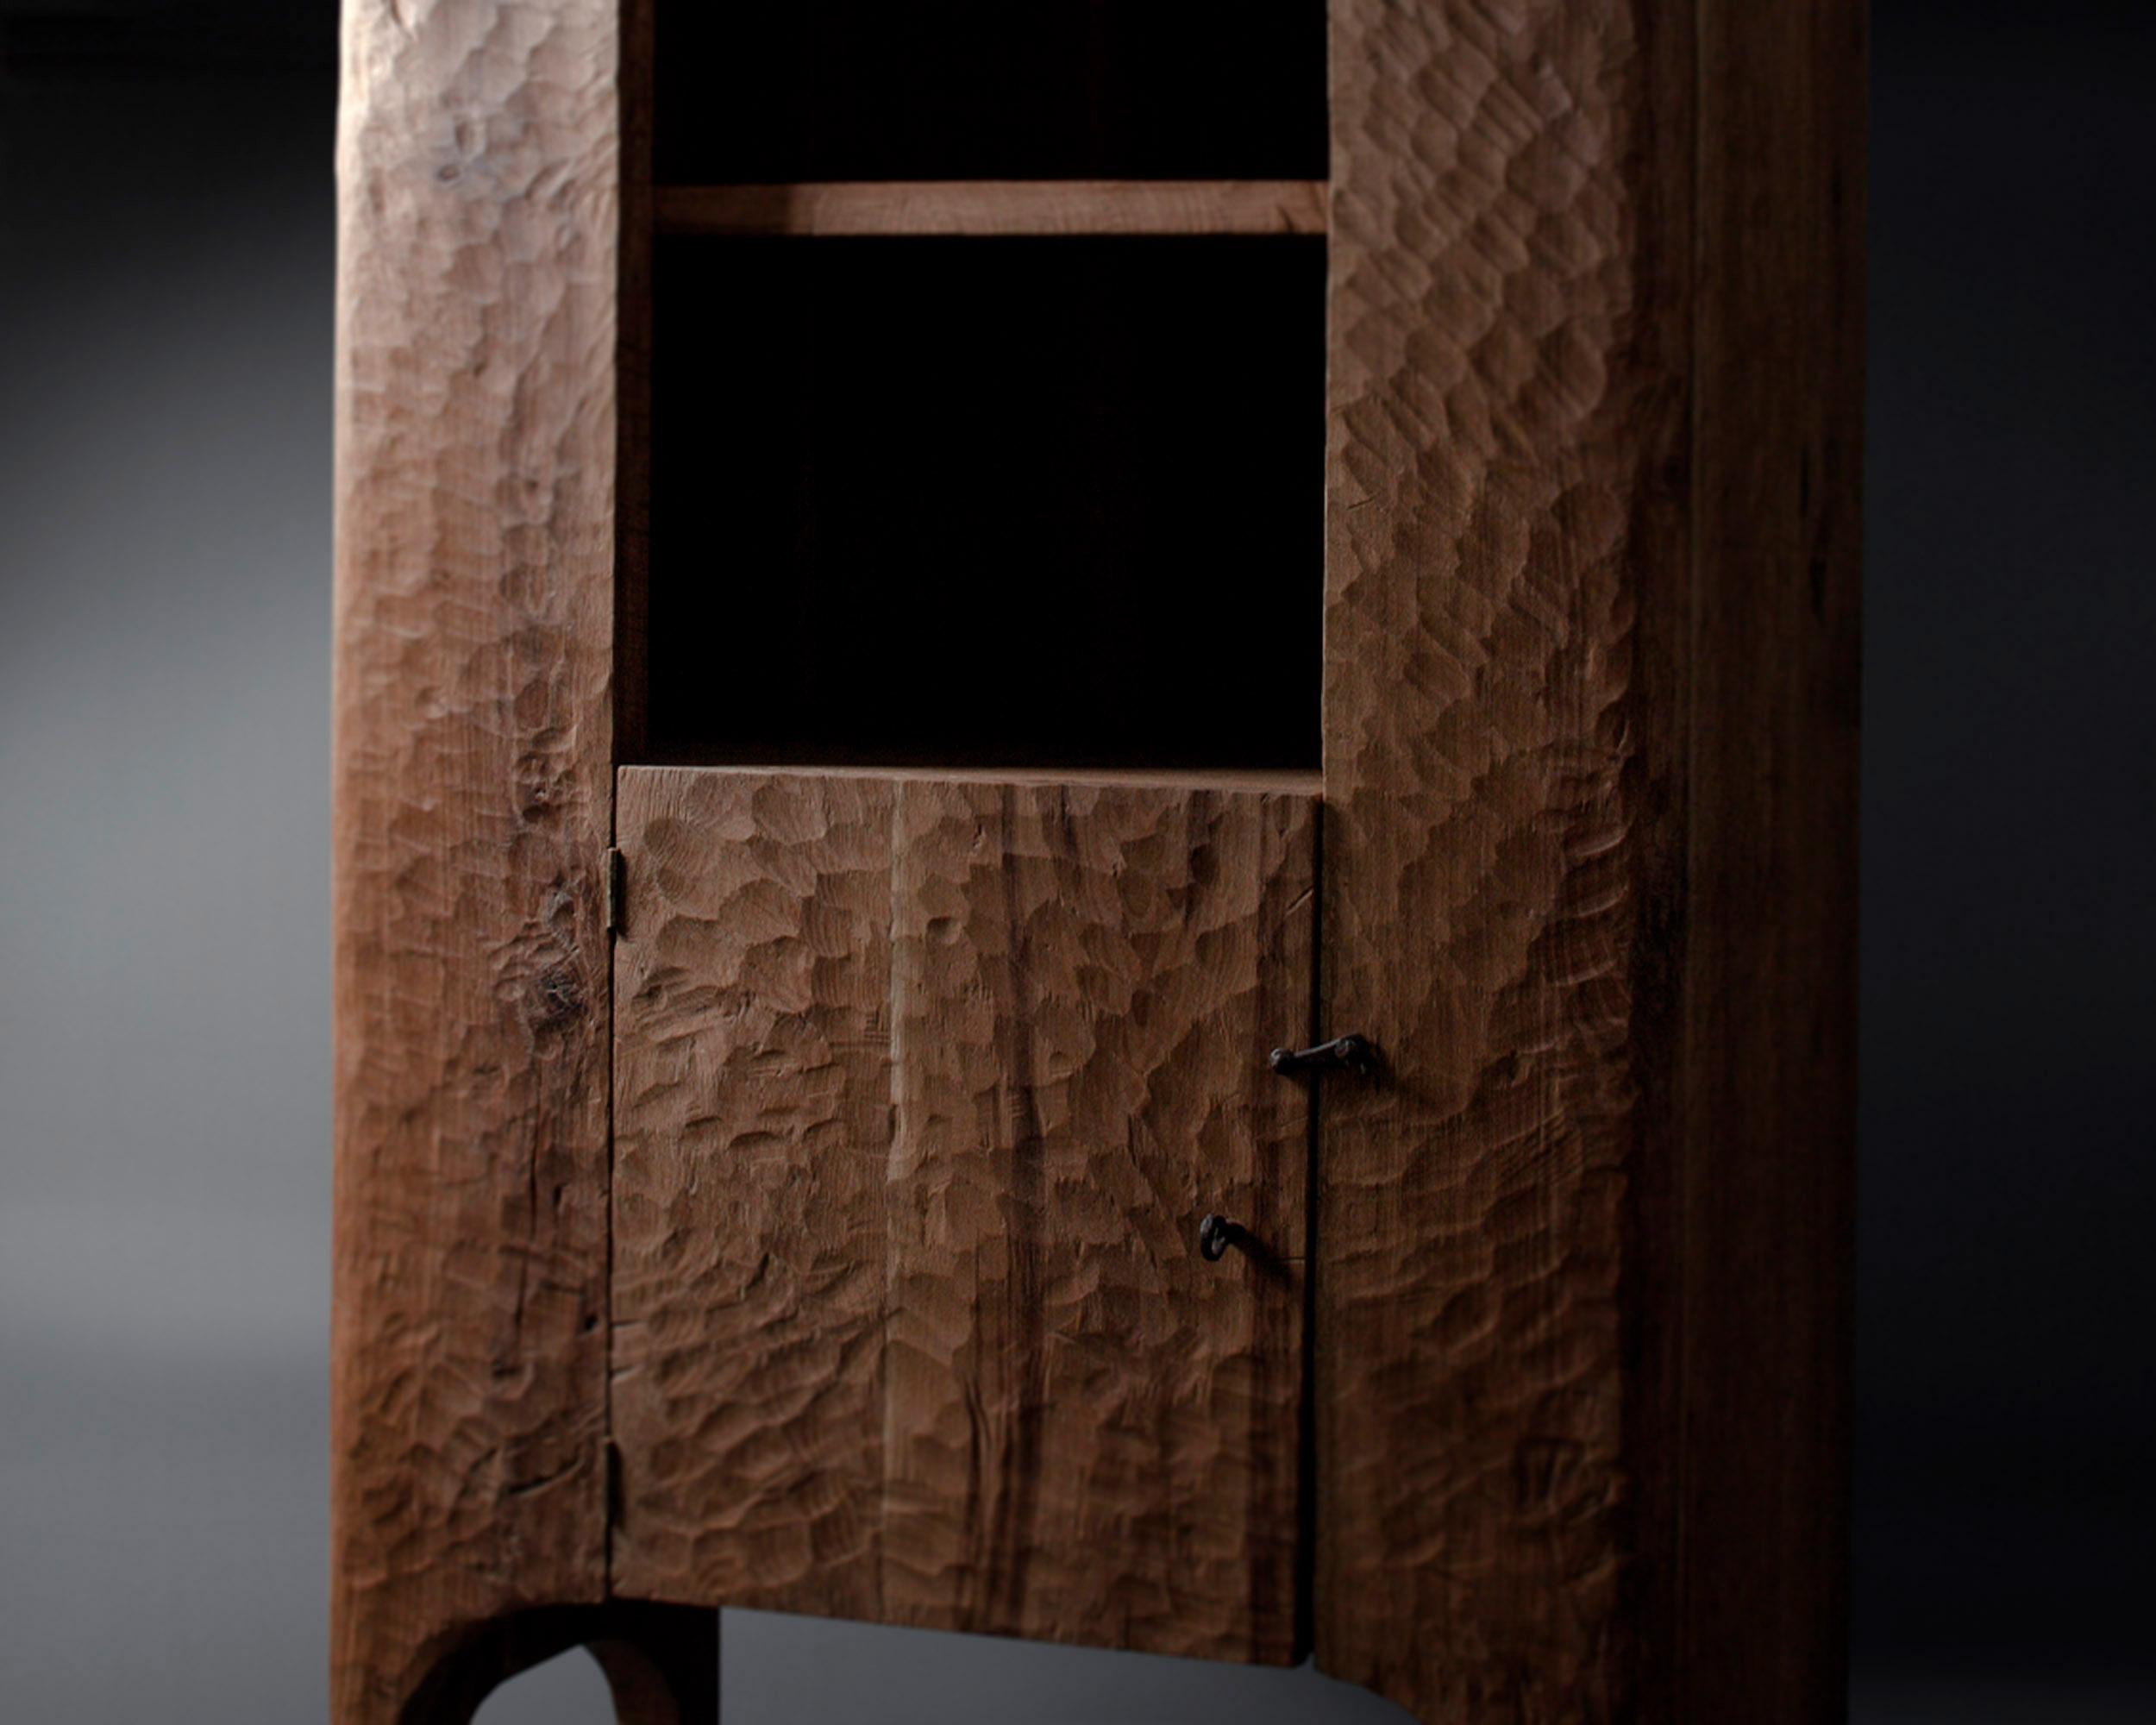 armoire-soha-concept-denis-milovanov